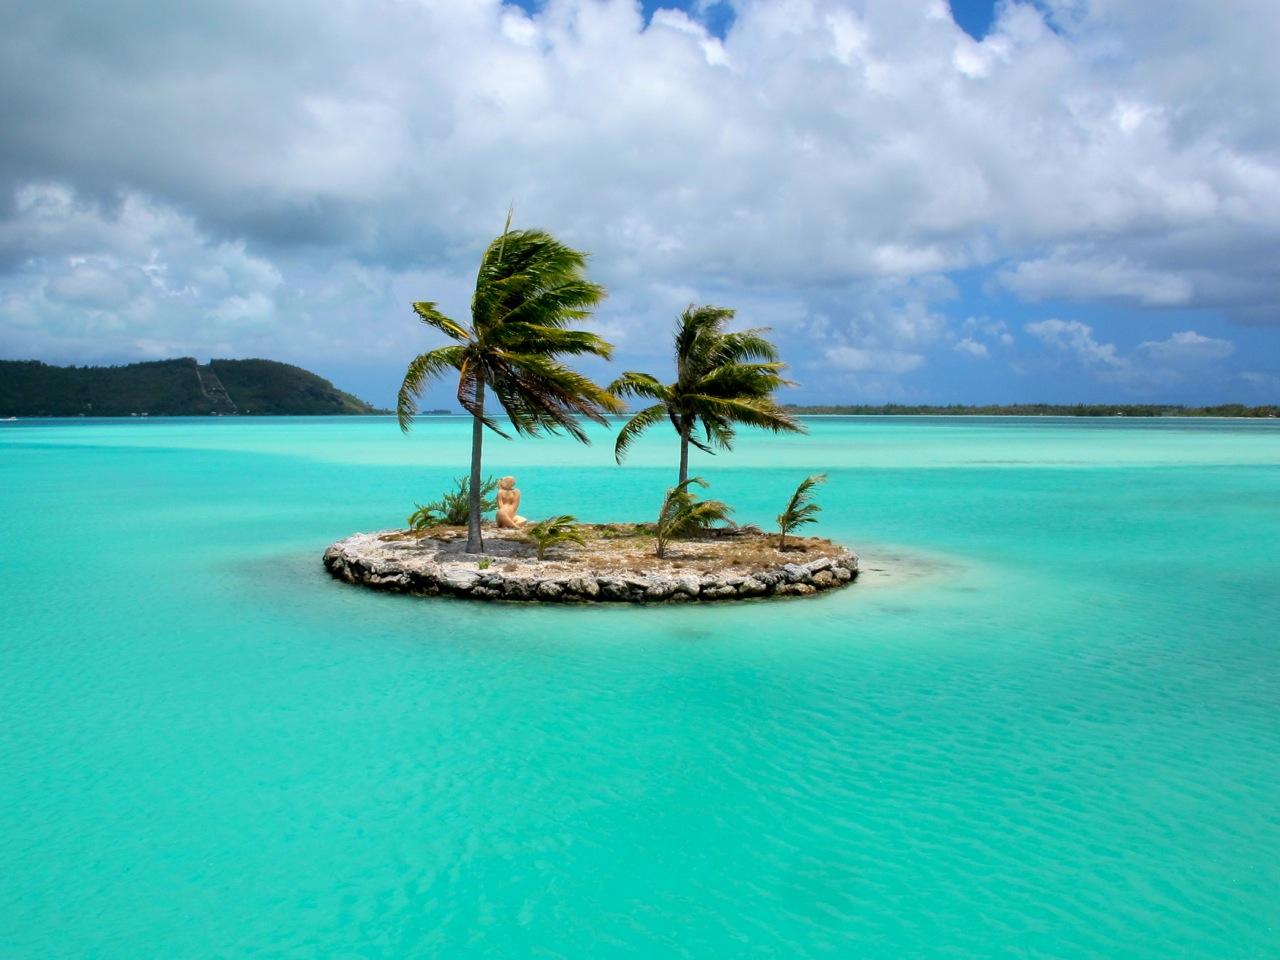 bora bora tahiti co franz sisch polynesien planen. Black Bedroom Furniture Sets. Home Design Ideas